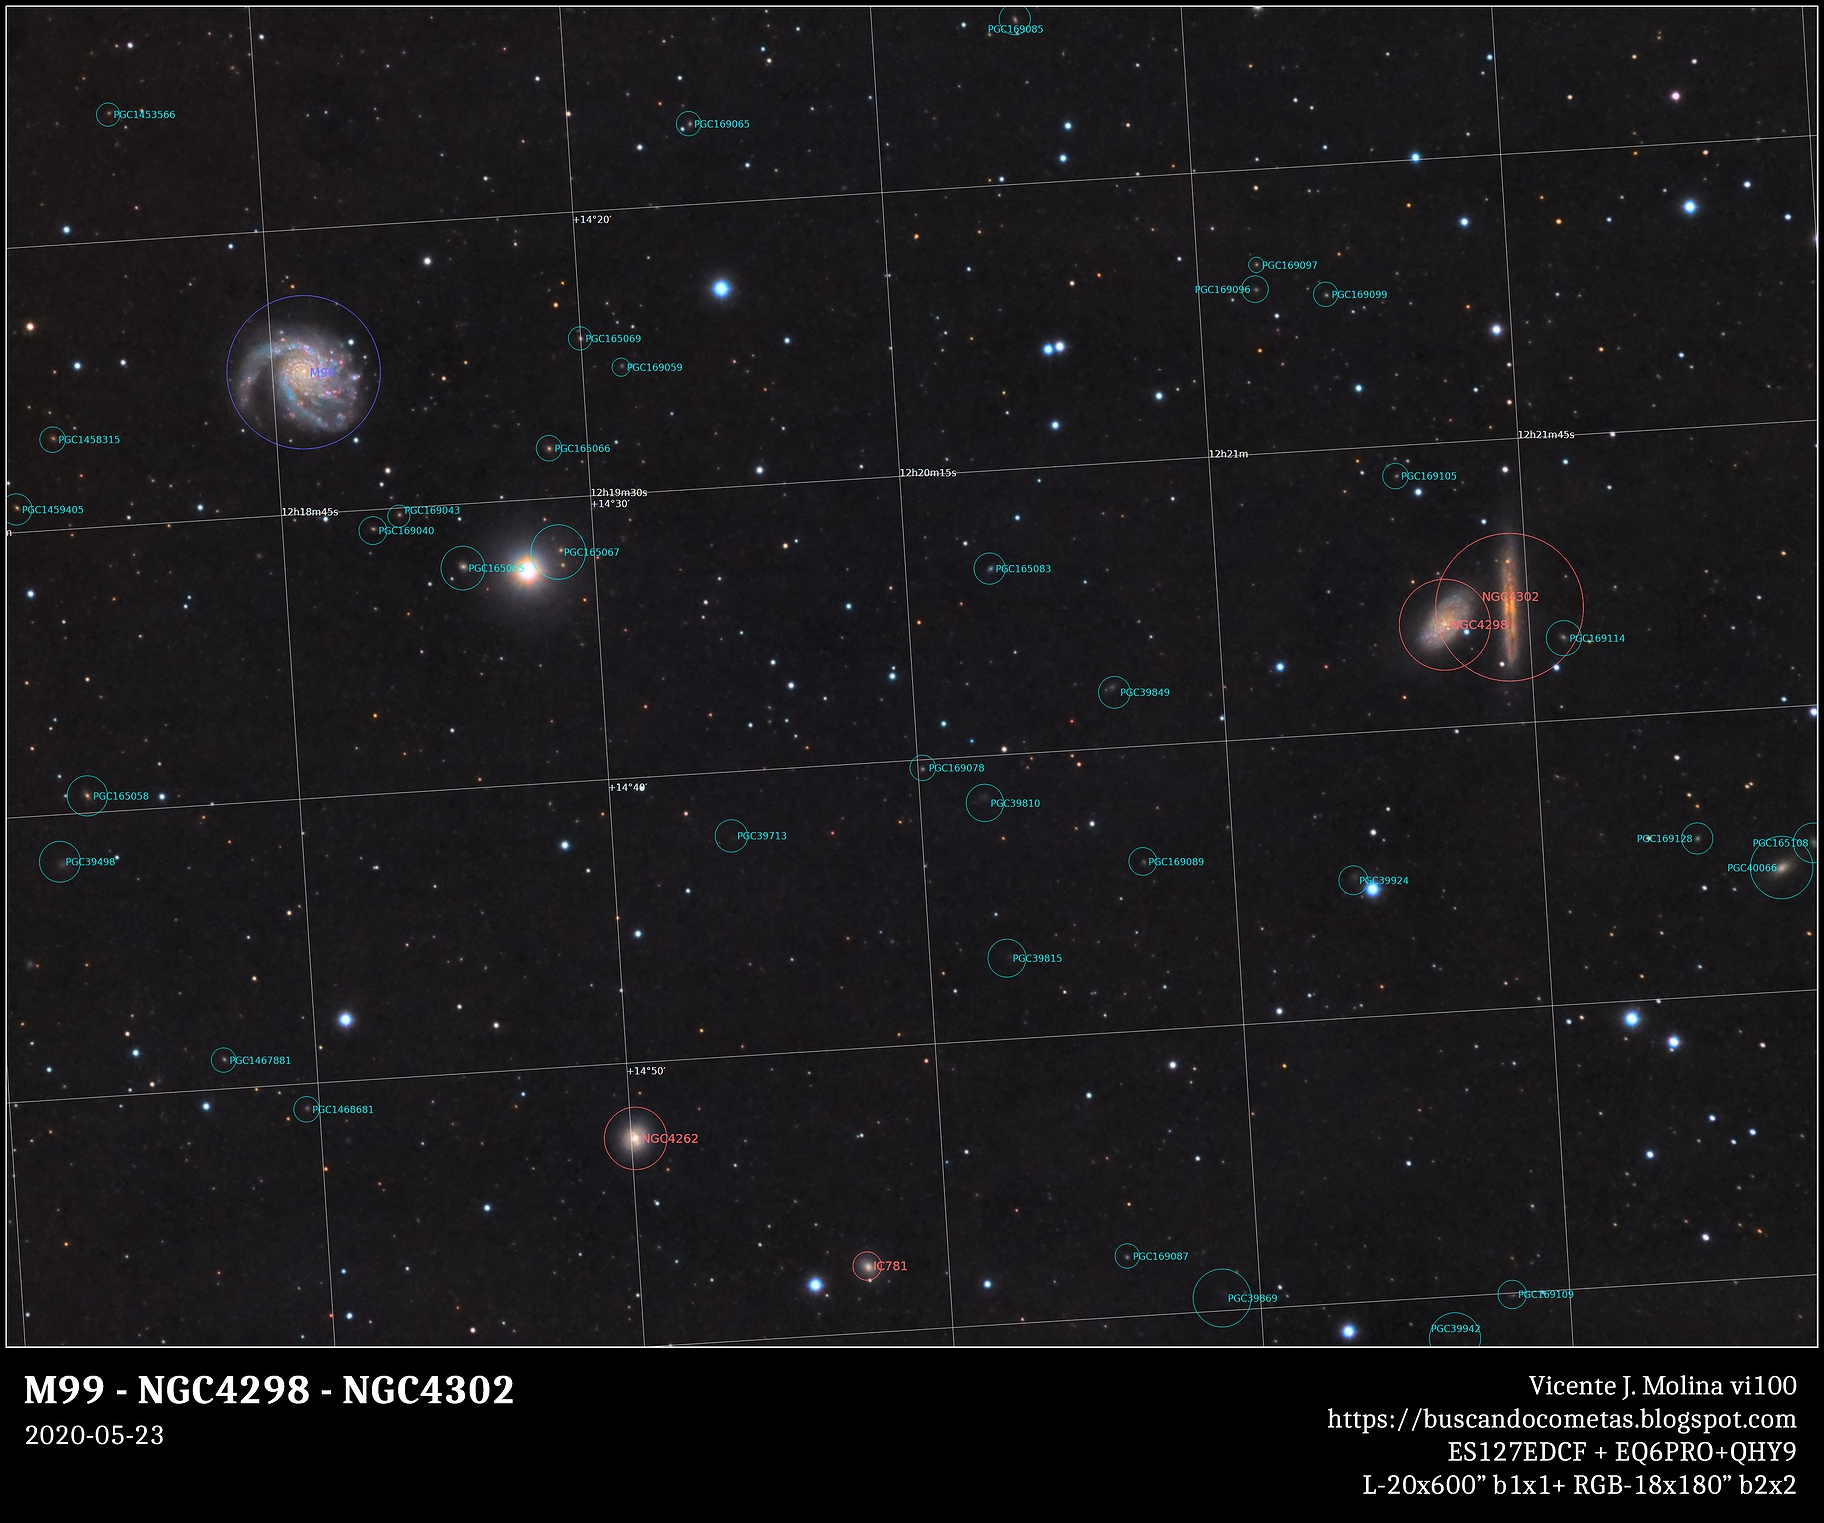 https://cdn.astrobin.com/thumbs/uWuB7ViZ_VNi_1824x0_5N-rsSTF.jpg